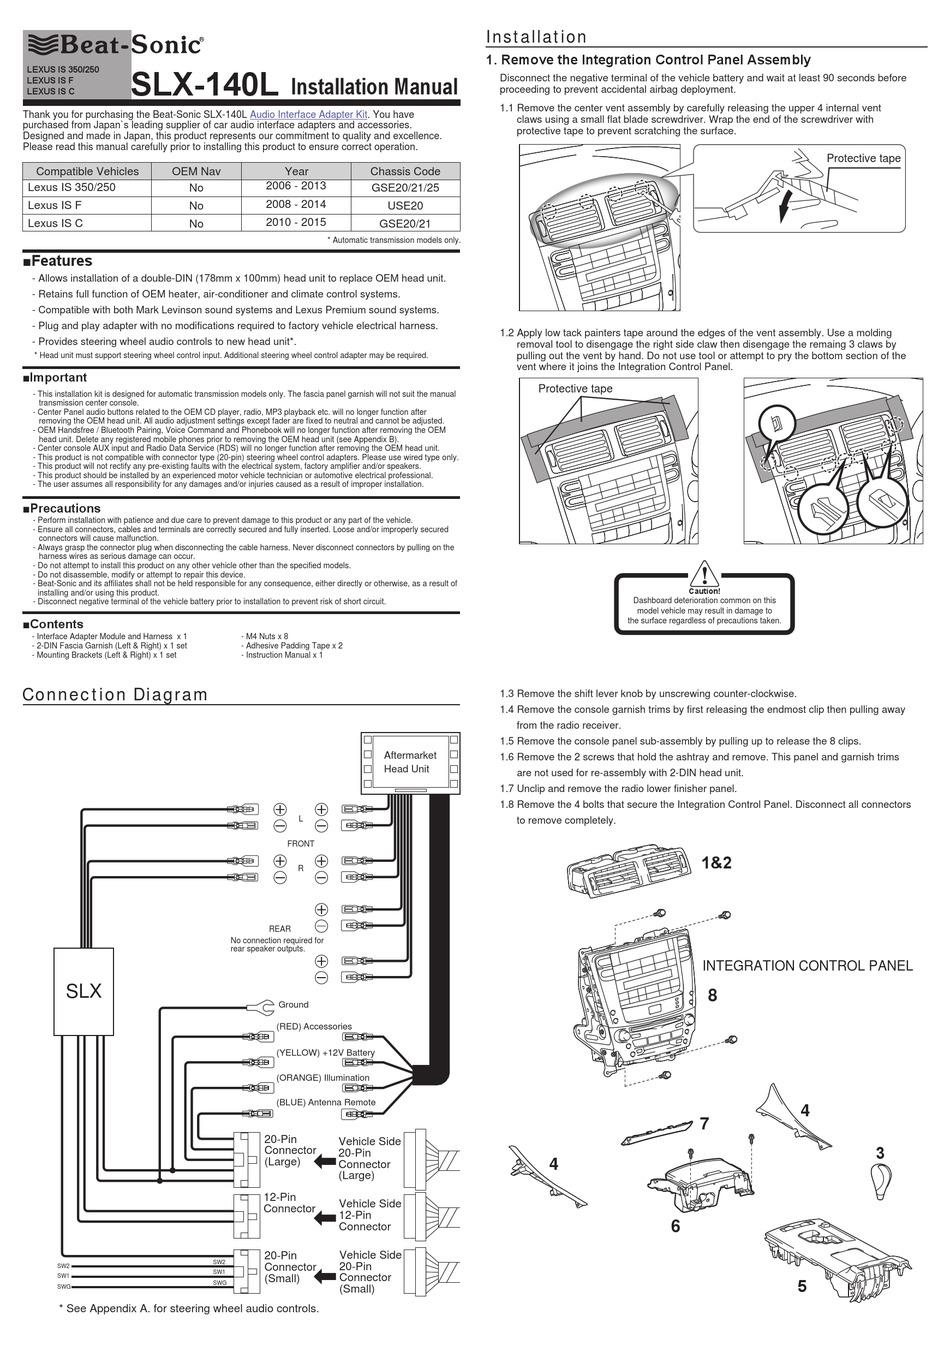 BEAT-SONIC SLX-140L INSTALLATION MANUAL Pdf Download